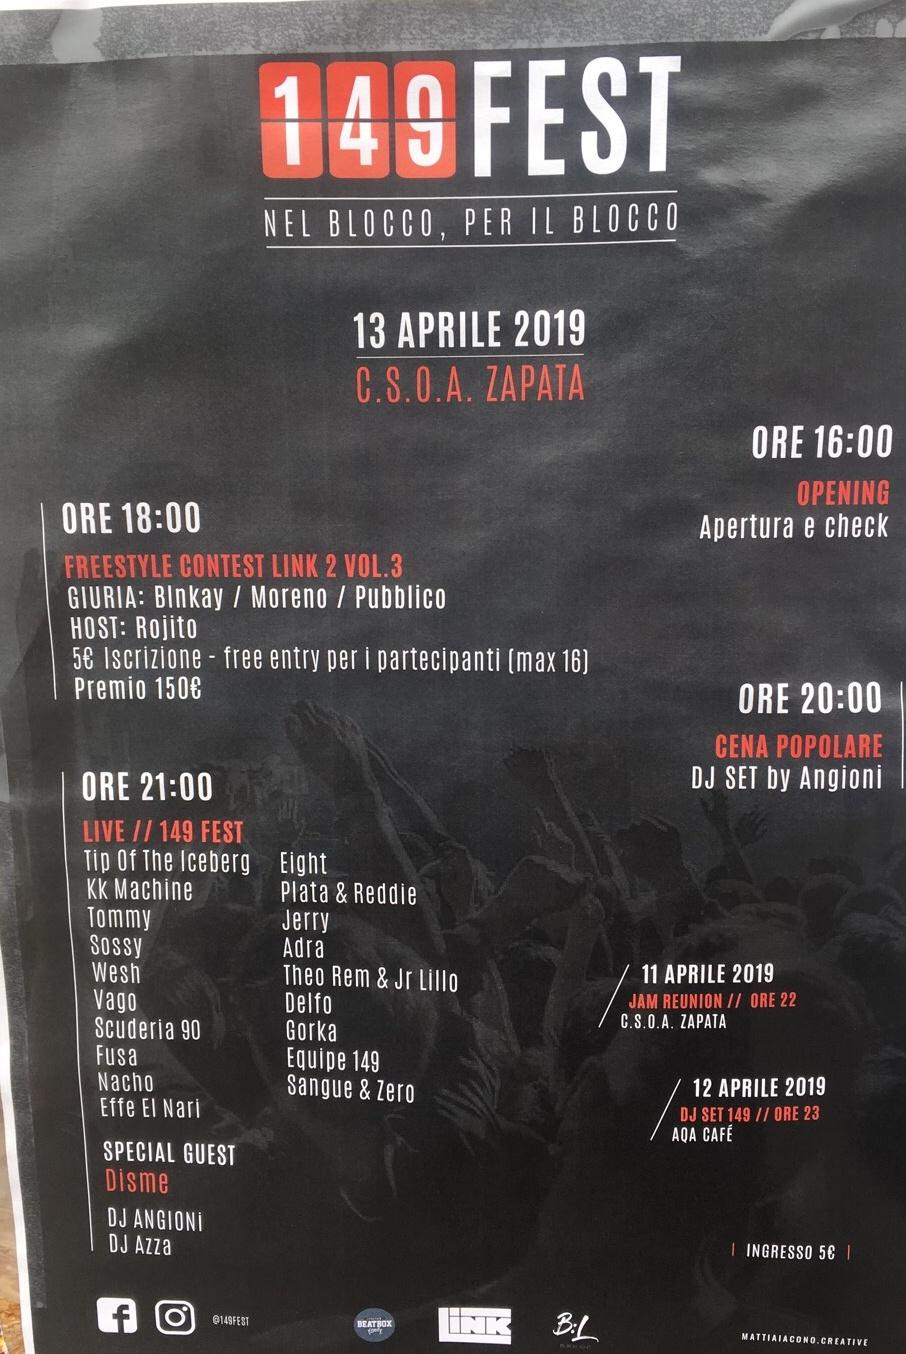 149 Fest CSOA Zapata Via San Pier d'Arena 36, 16151 Genova Dal 13/04/2019 Al 13/04/2019 18:00 - 03:00